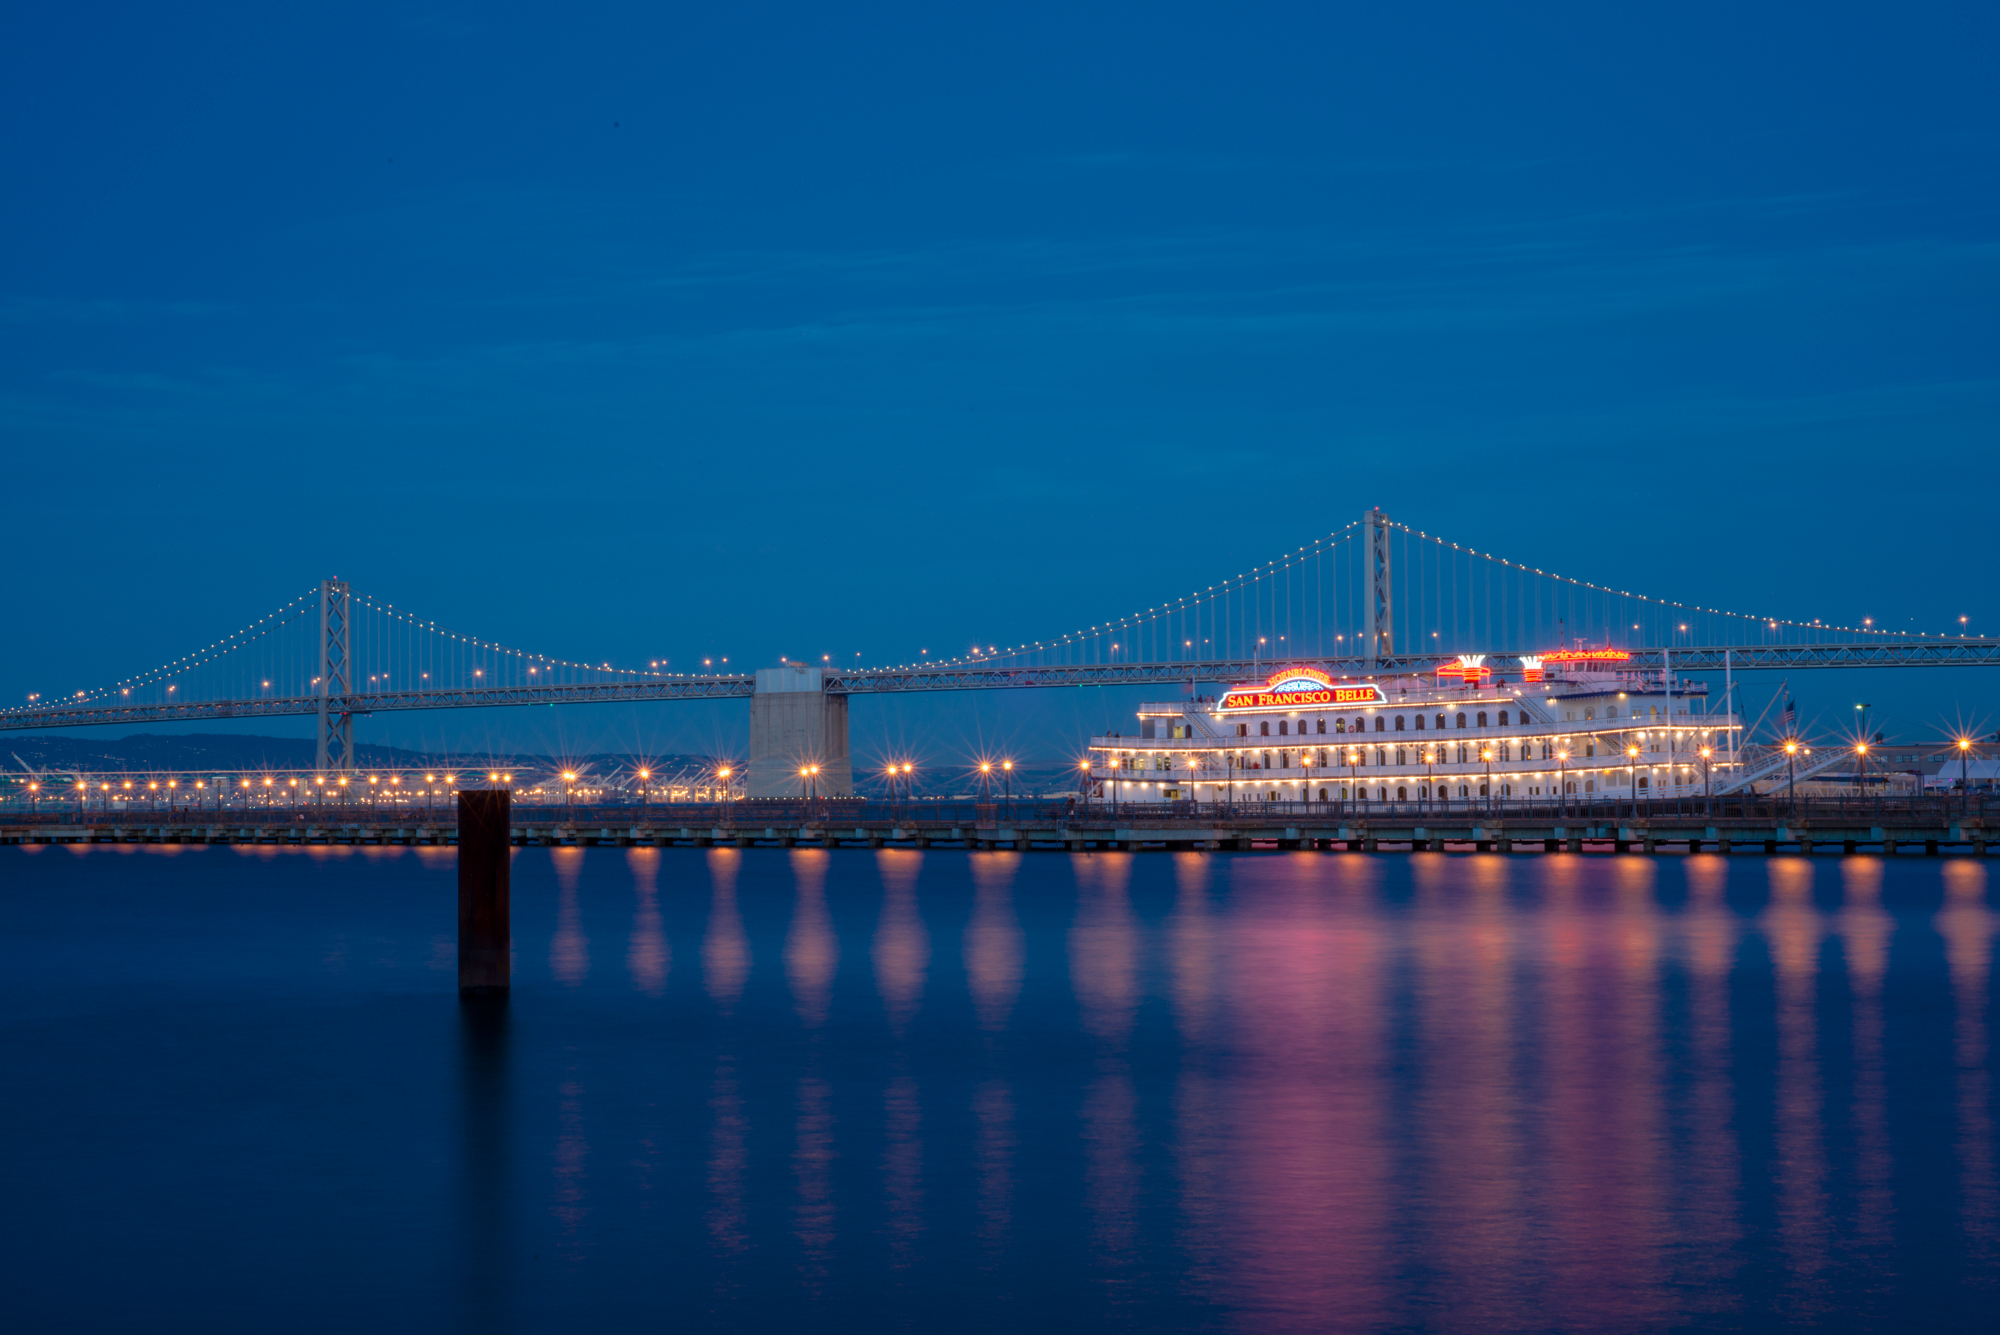 San Fransisco Bay Bridge, USA